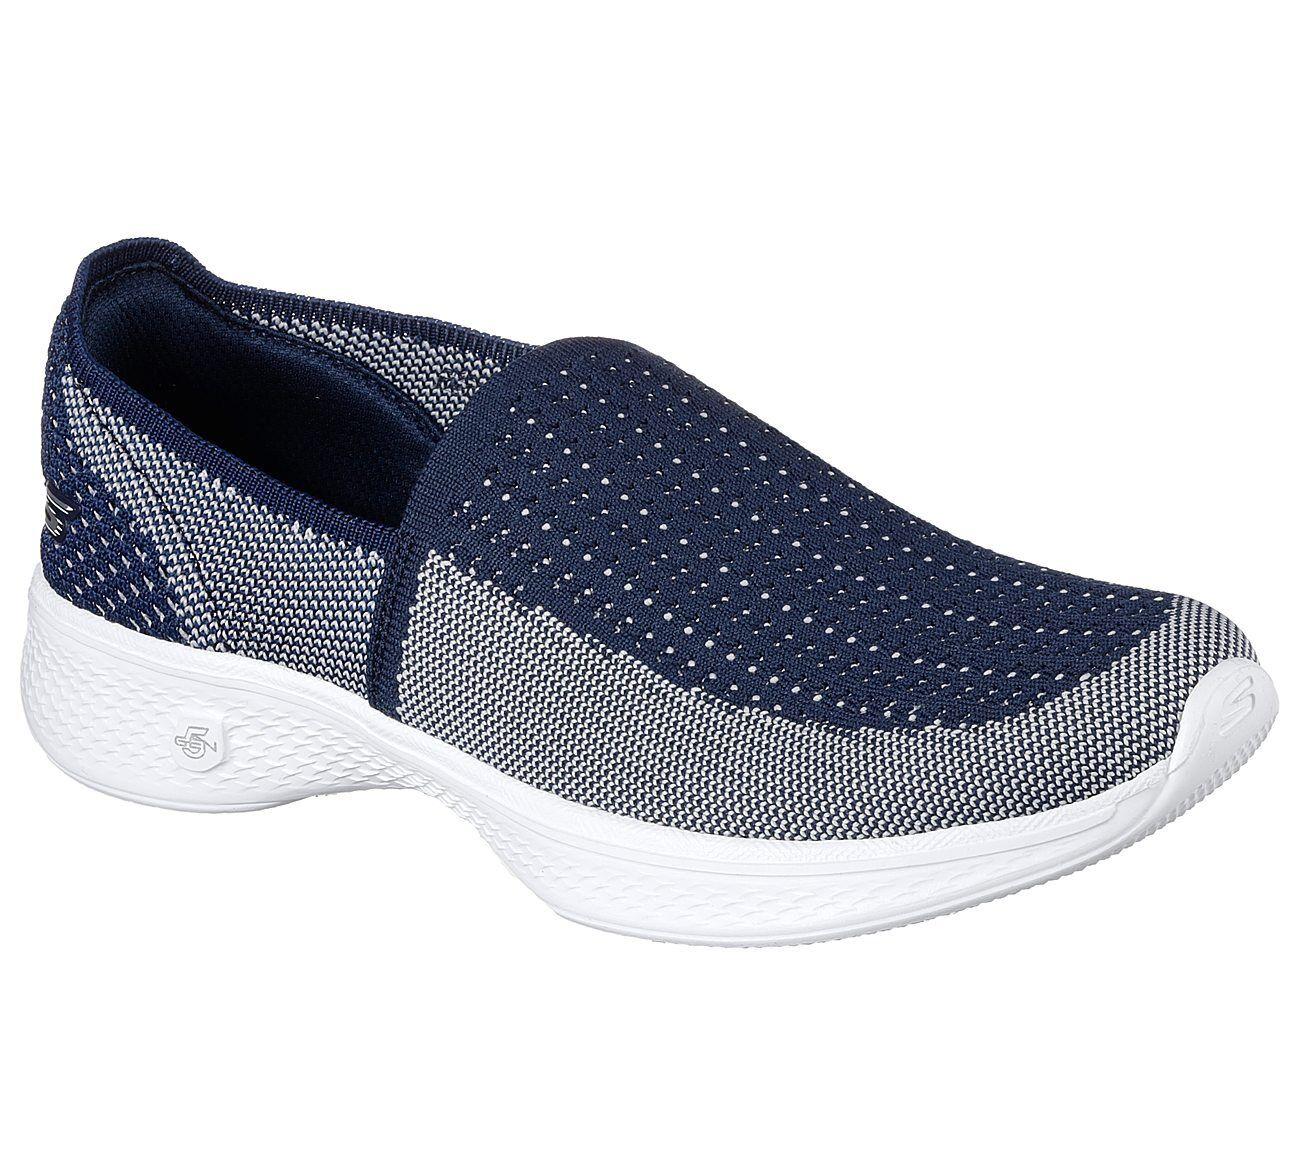 Skechers Mujer Mujer Mujer Go Walk 4 - Ravish,Comodidad Al Caminar Zapatos 14924 Azul Marino  barato